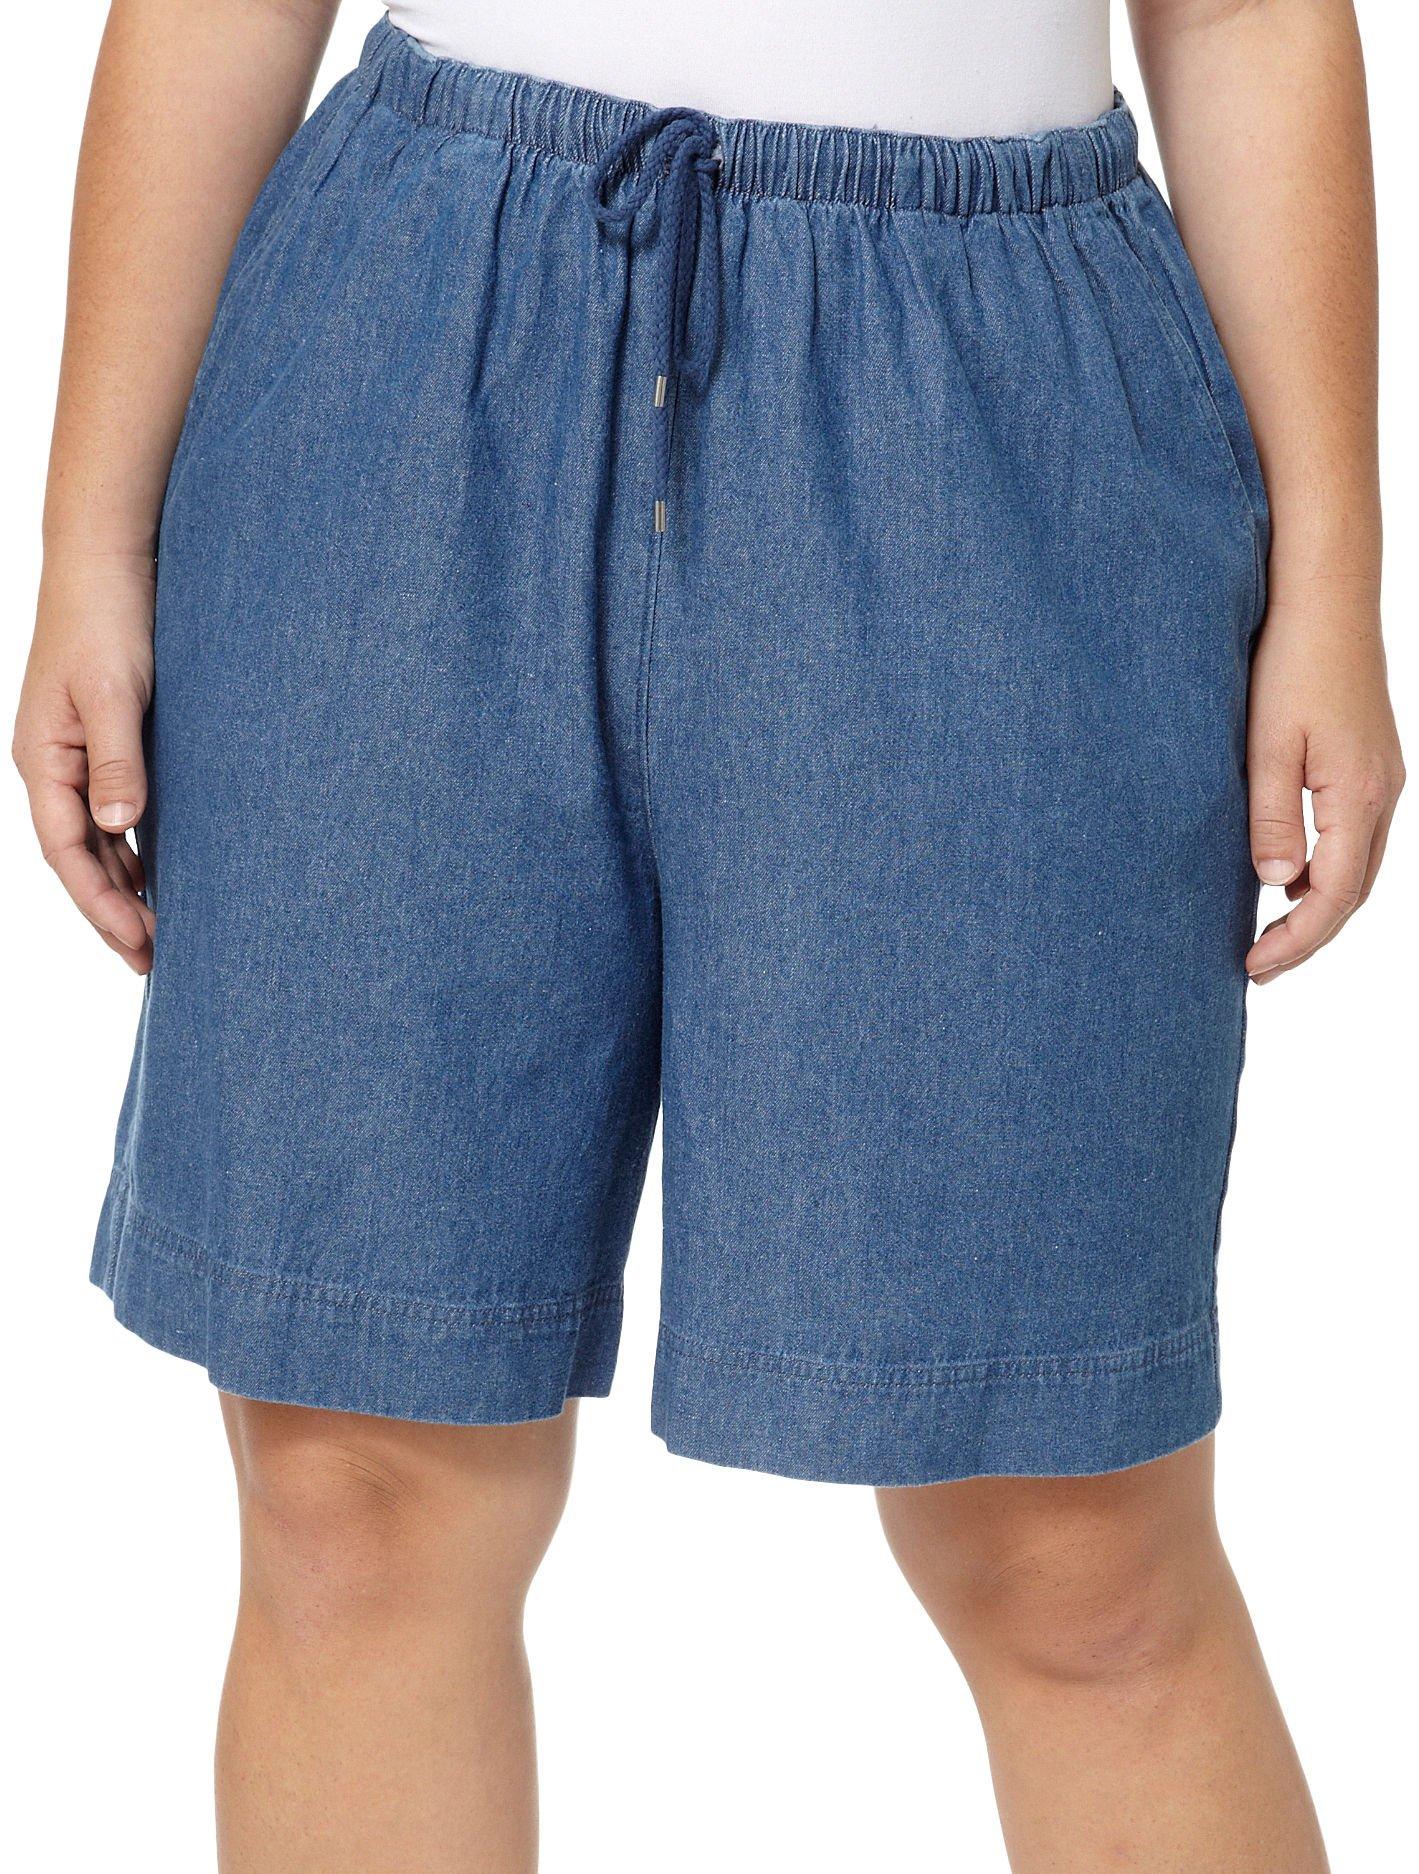 Coral Bay Plus Twill Drawstring Shorts 3X Medium chambray blue